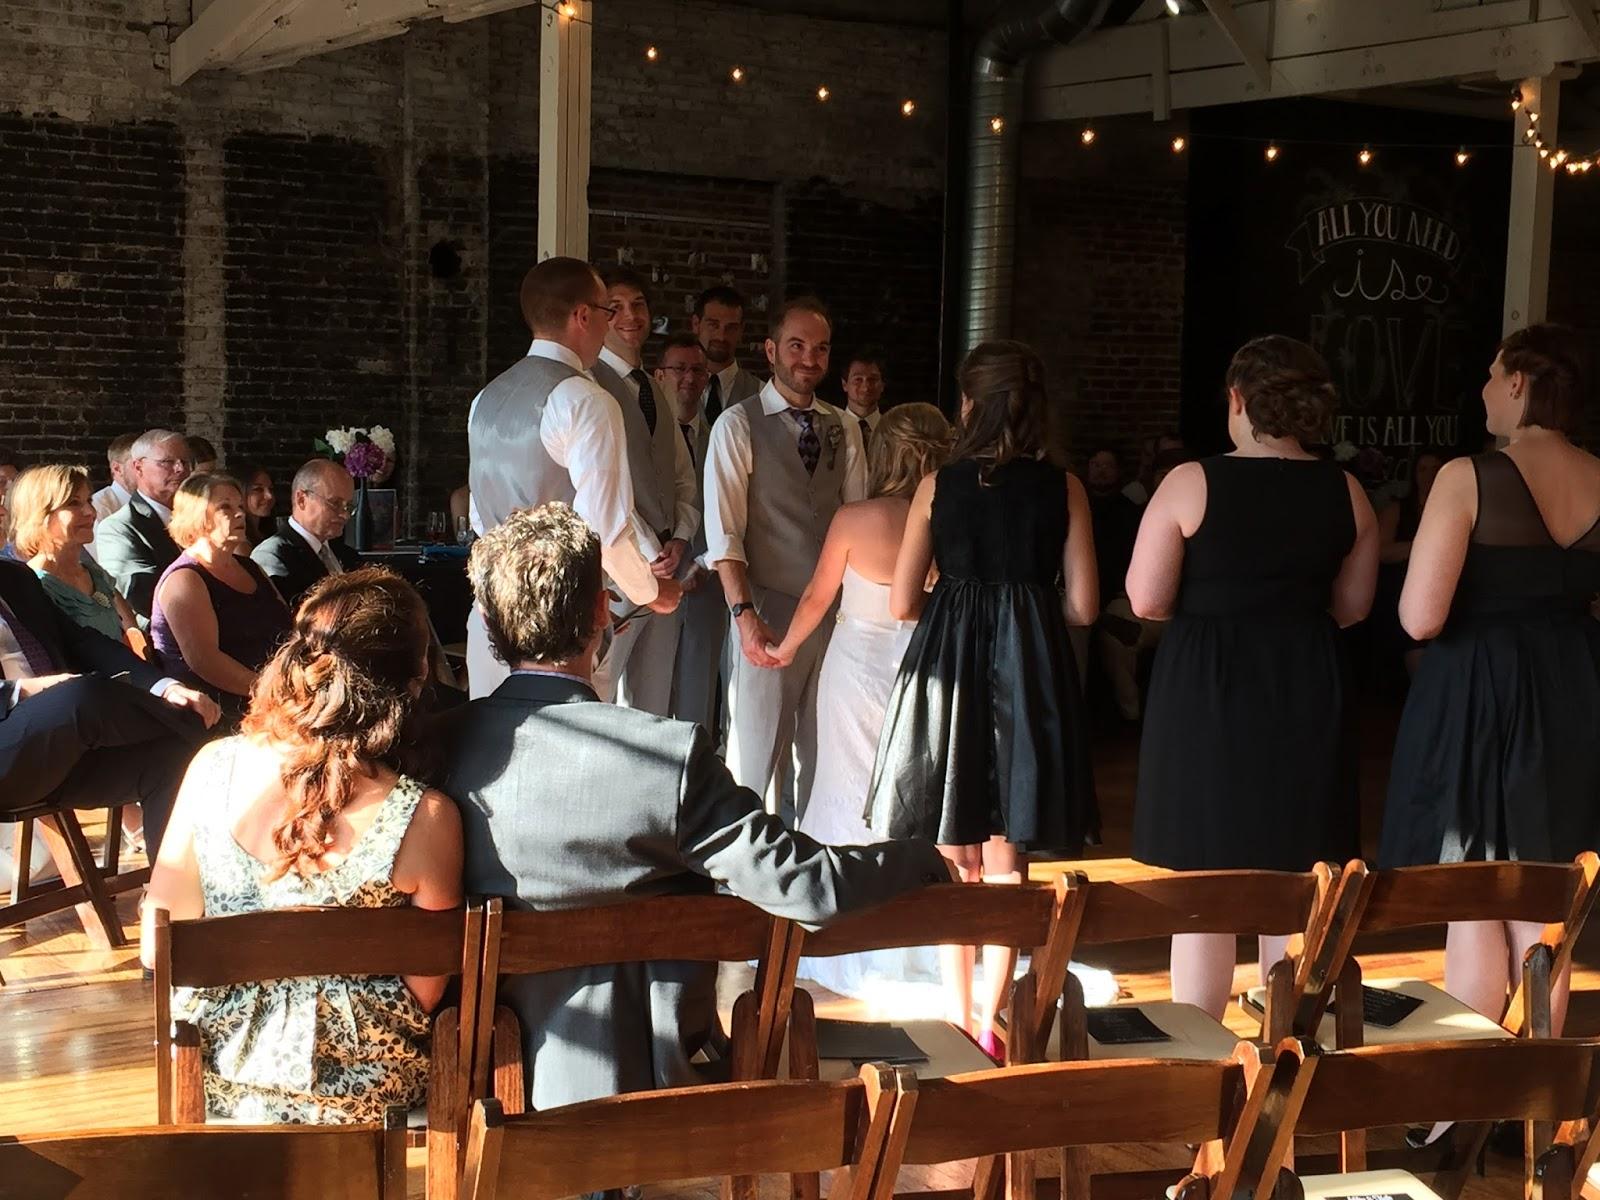 Dj Randy Bs Weddings And Events Ashley Kyles Comic Book Themed